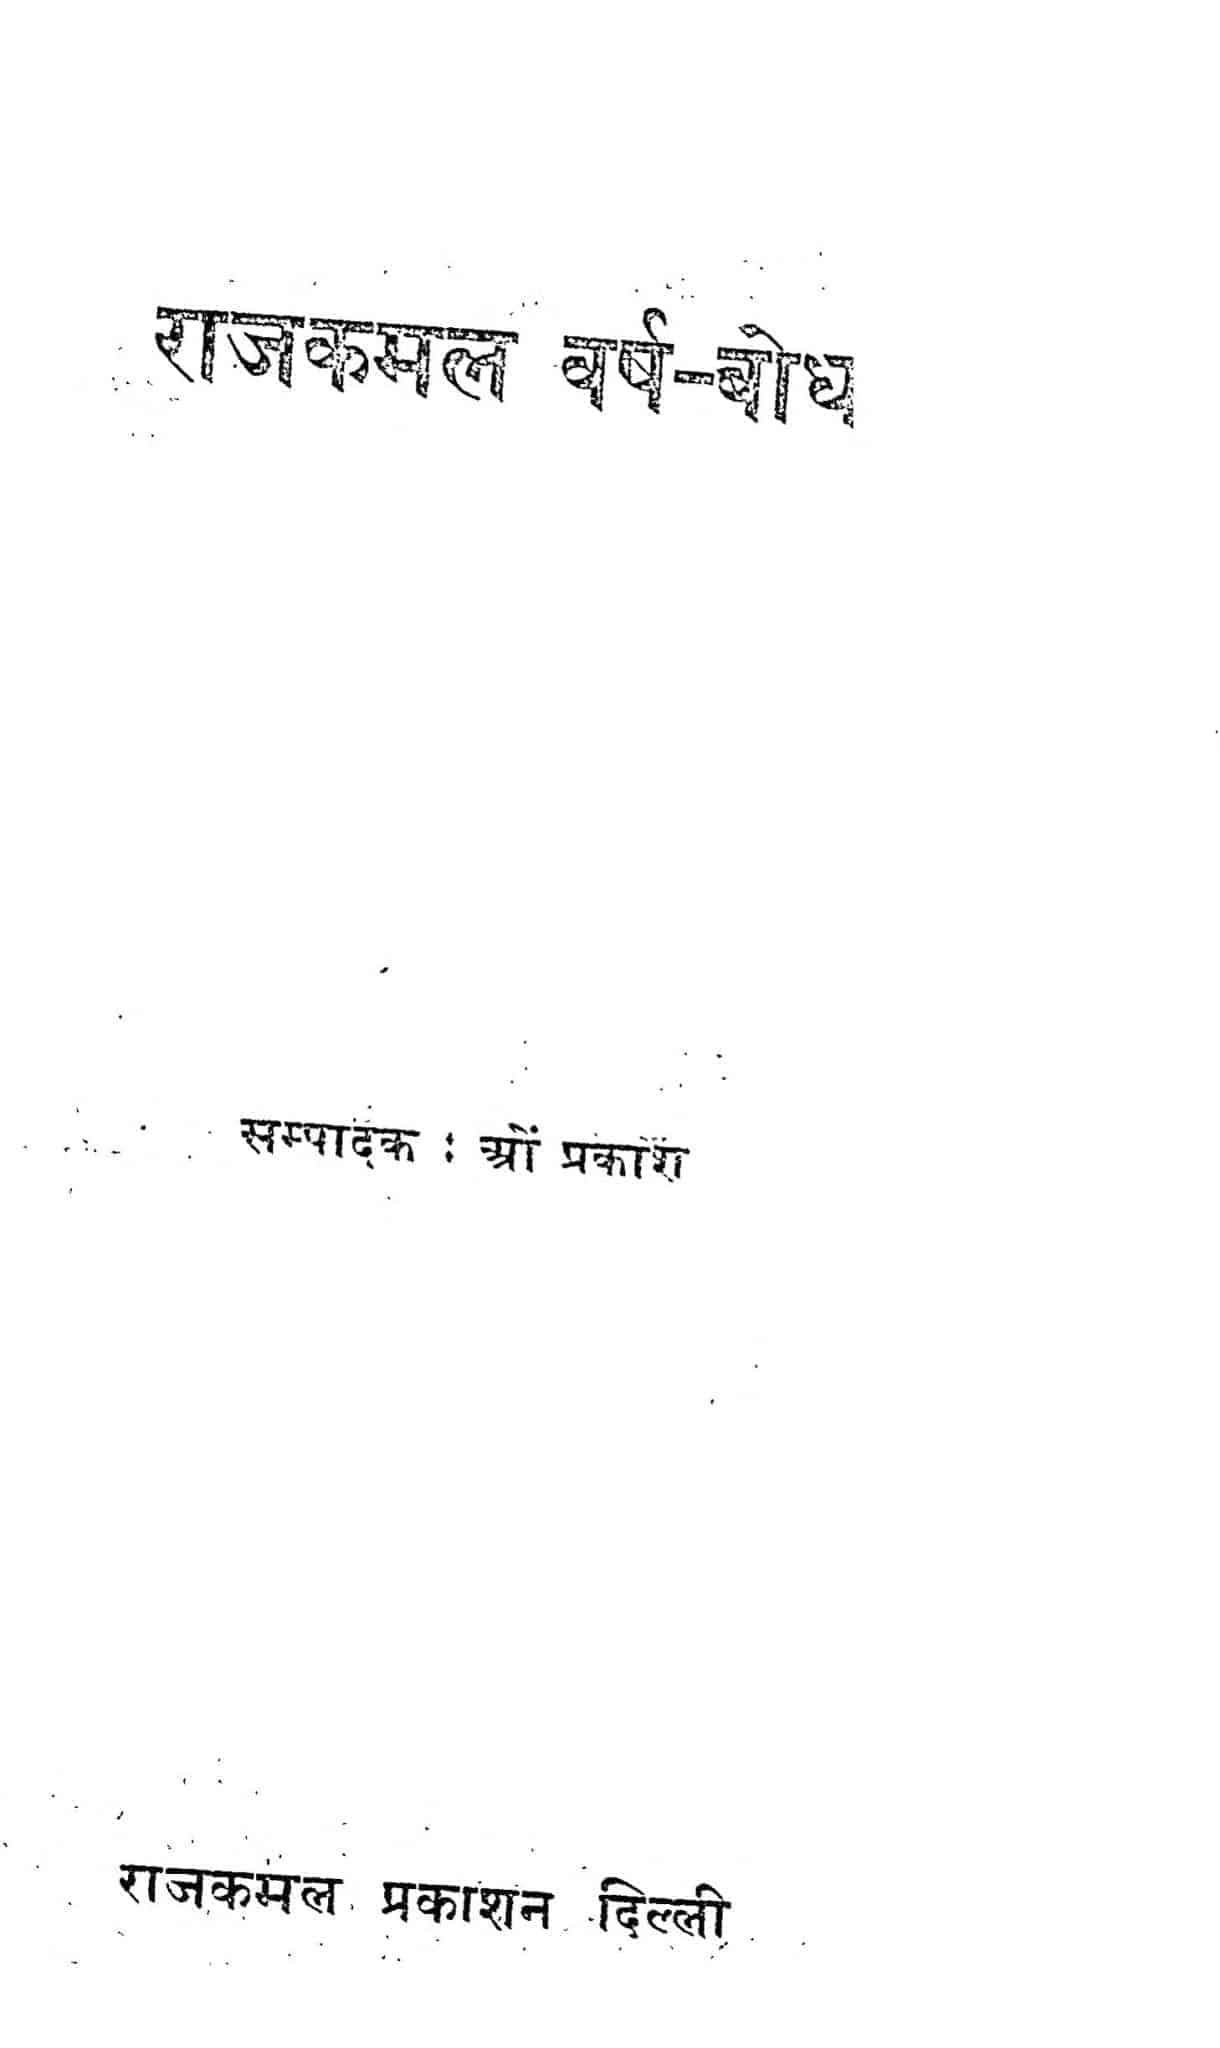 Book Image : राजकमल वर्ष-बोध - Rajkamal Varsh - Bhodh